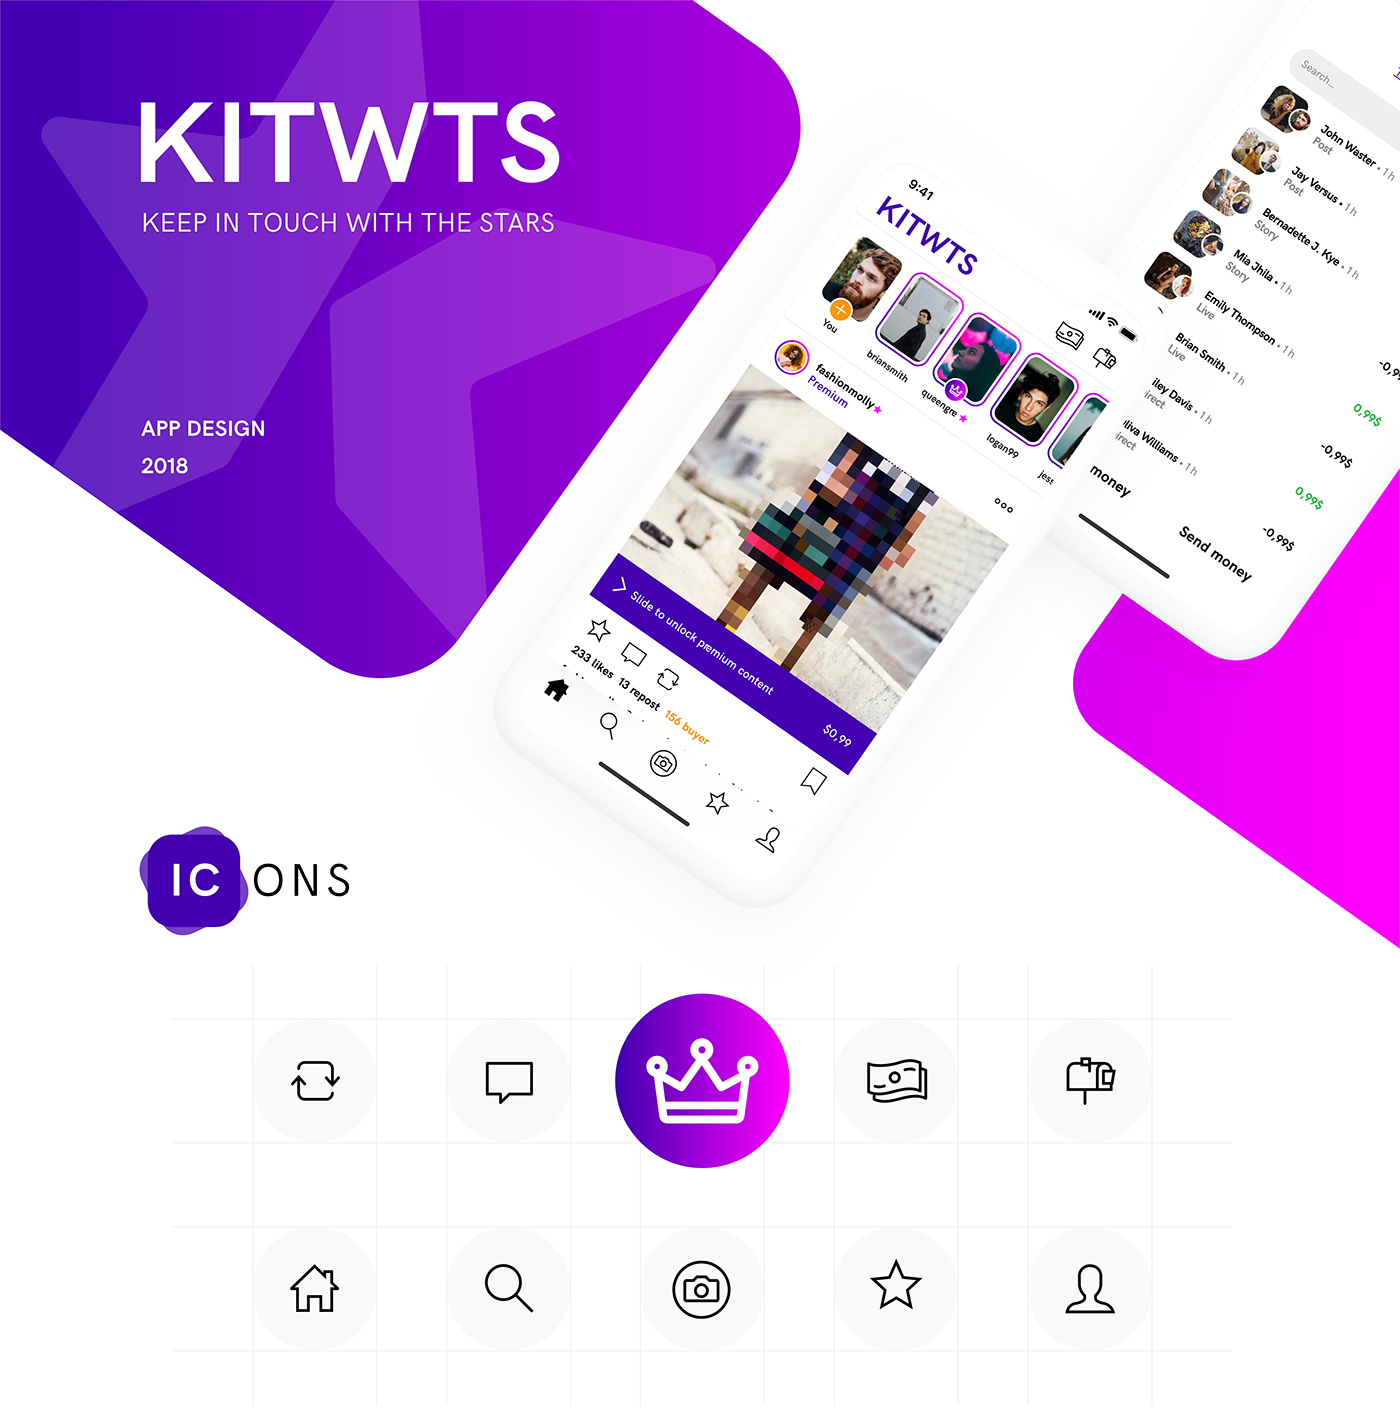 KITWTS social network mobile design application UI branding  follower smartphone animation